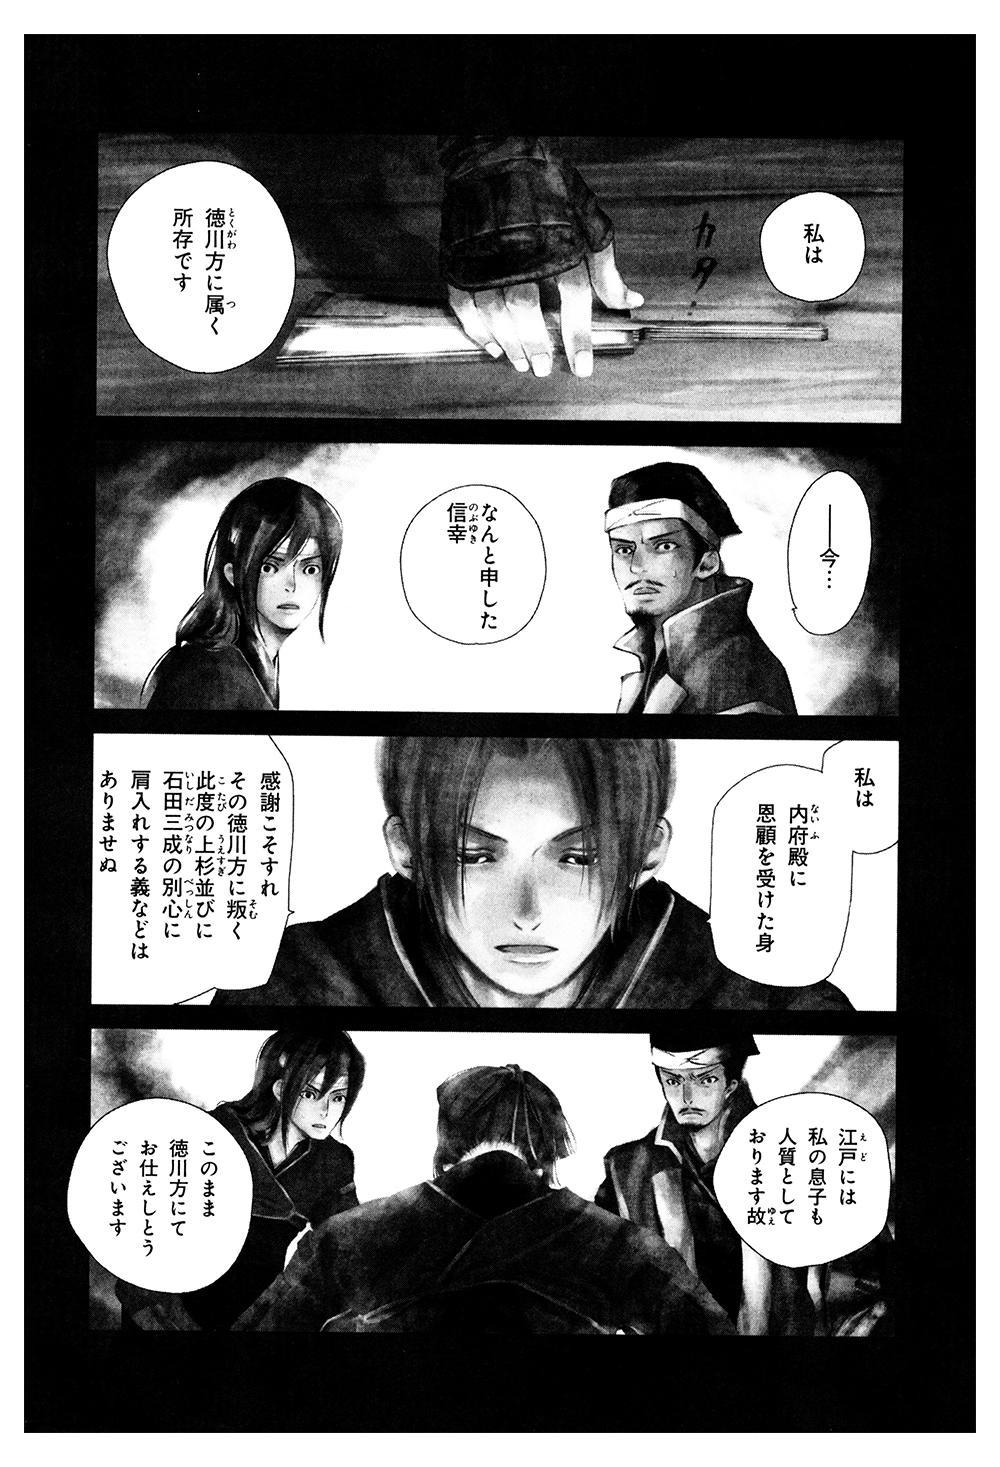 朱黒の仁 第1話①syukoku-1-01.jpg